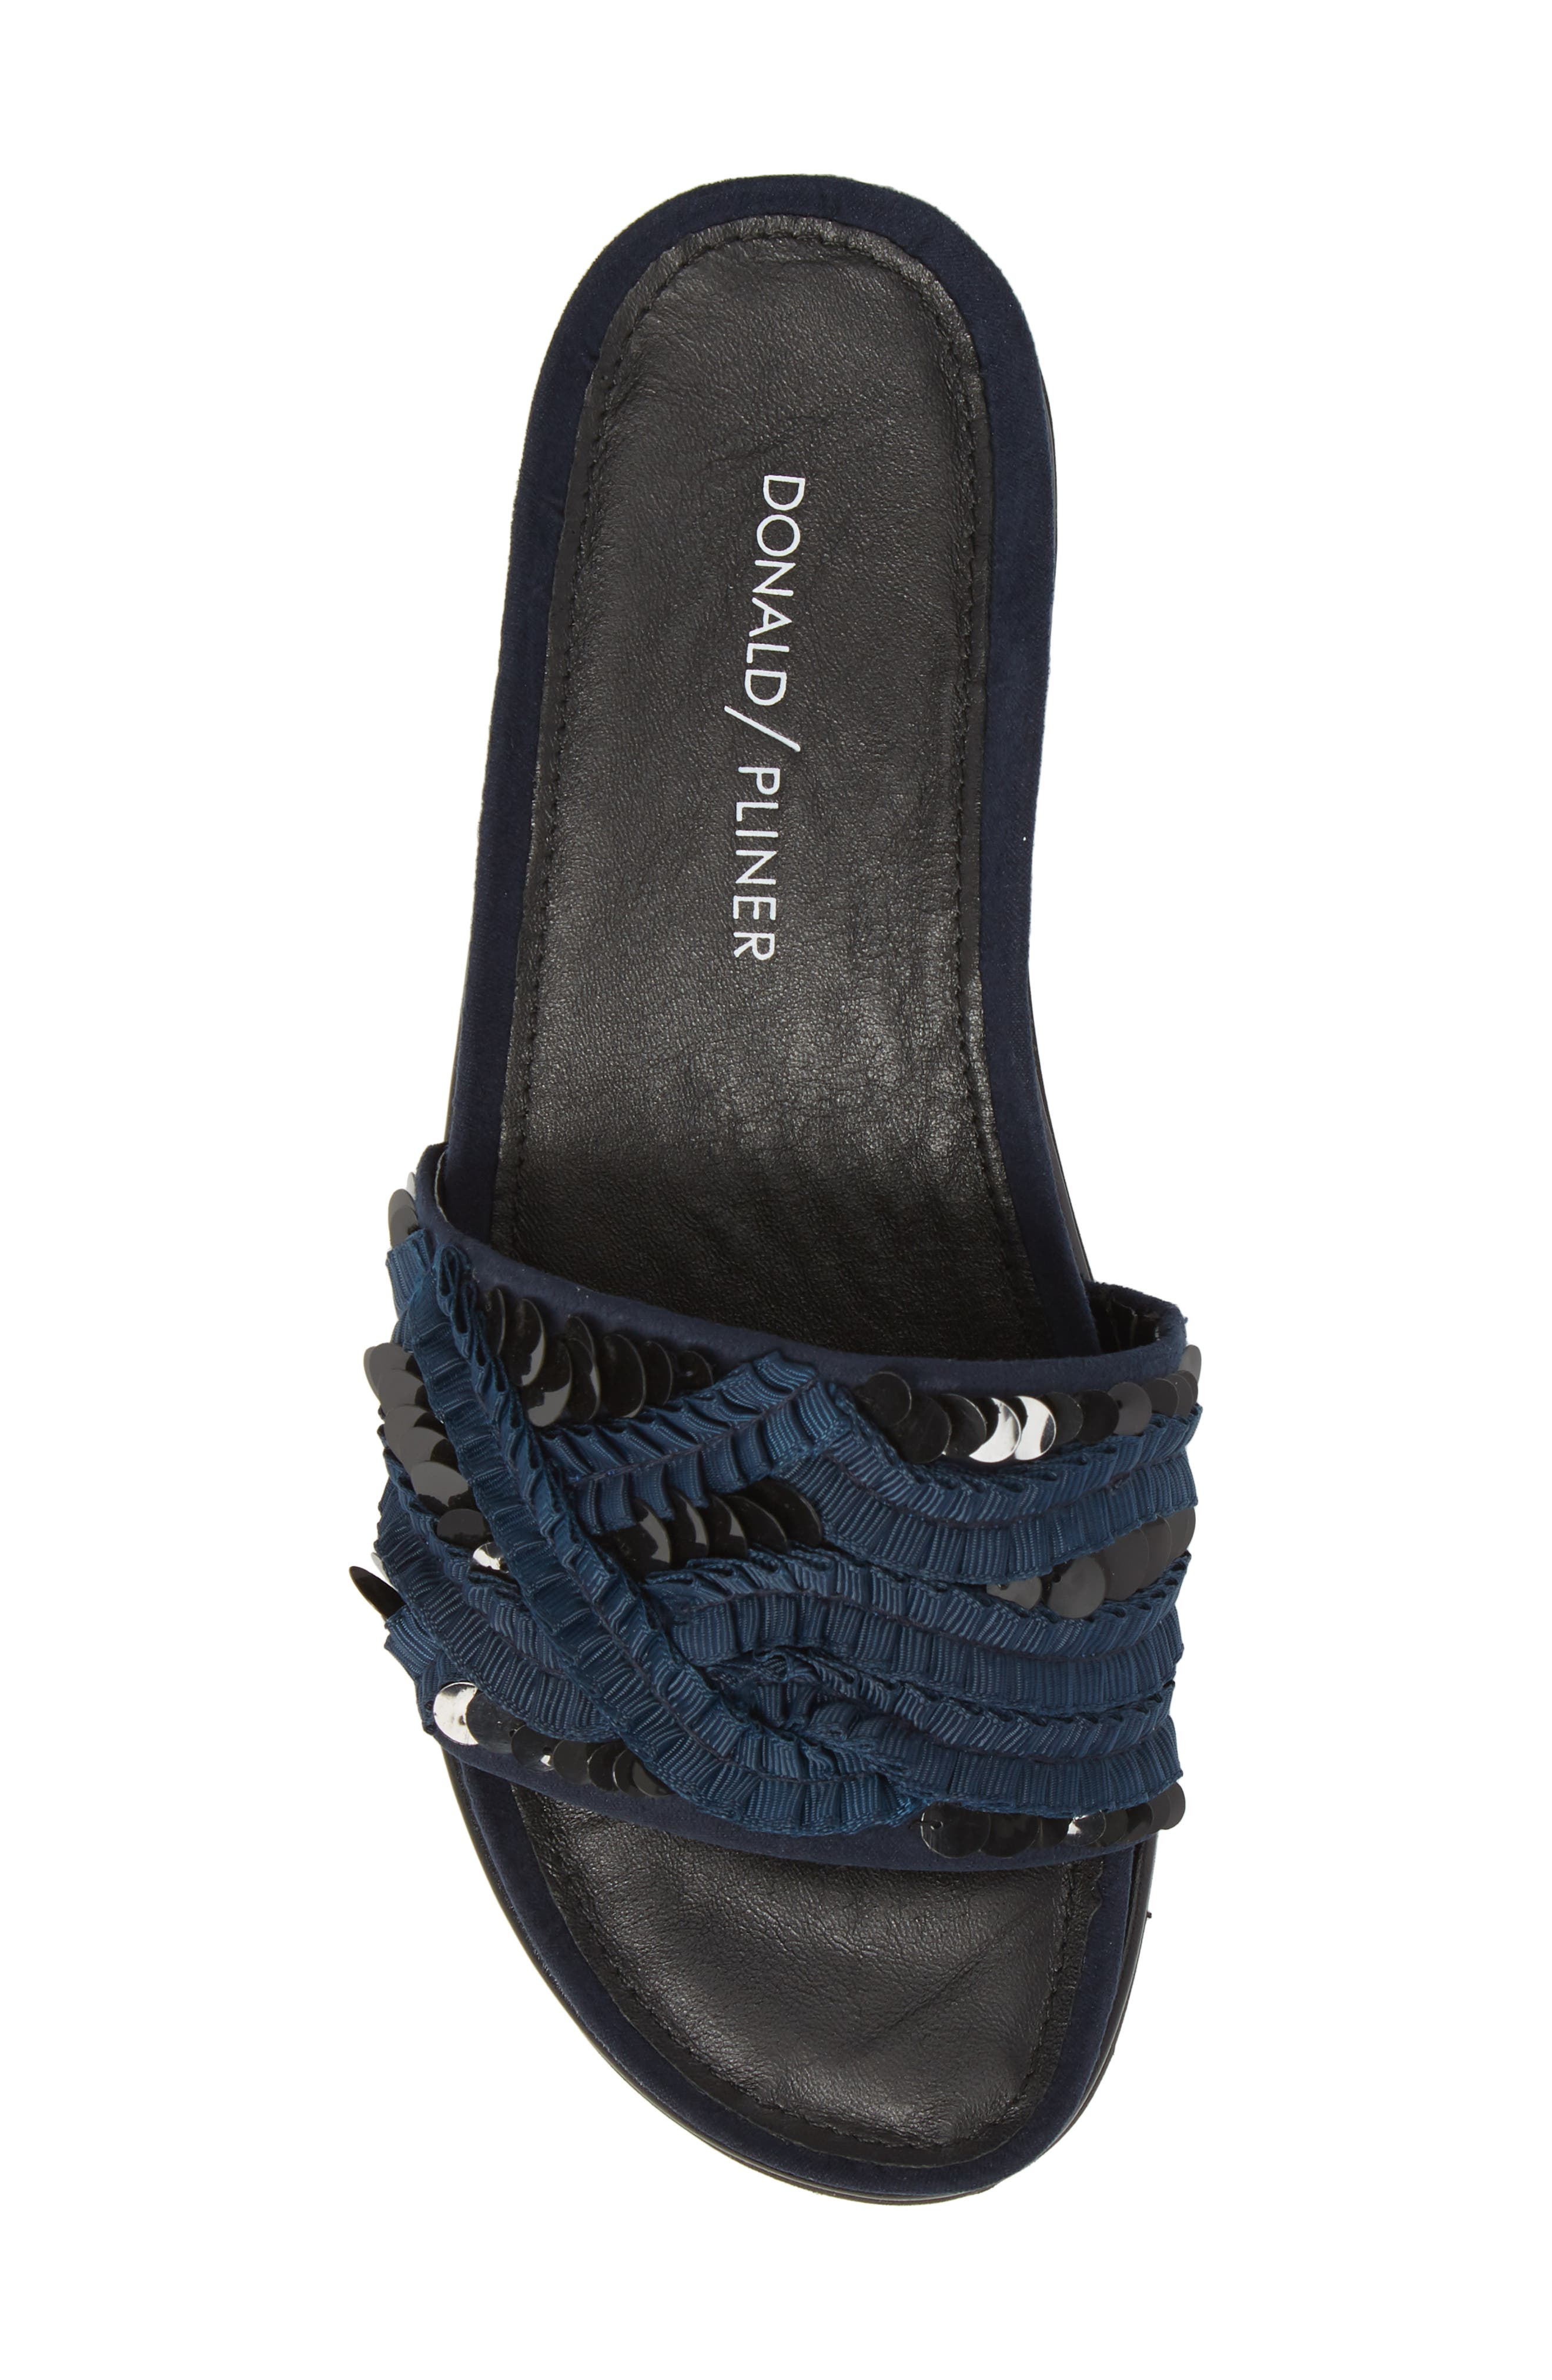 Cava Slide Sandal,                             Alternate thumbnail 5, color,                             NAVY SUEDE